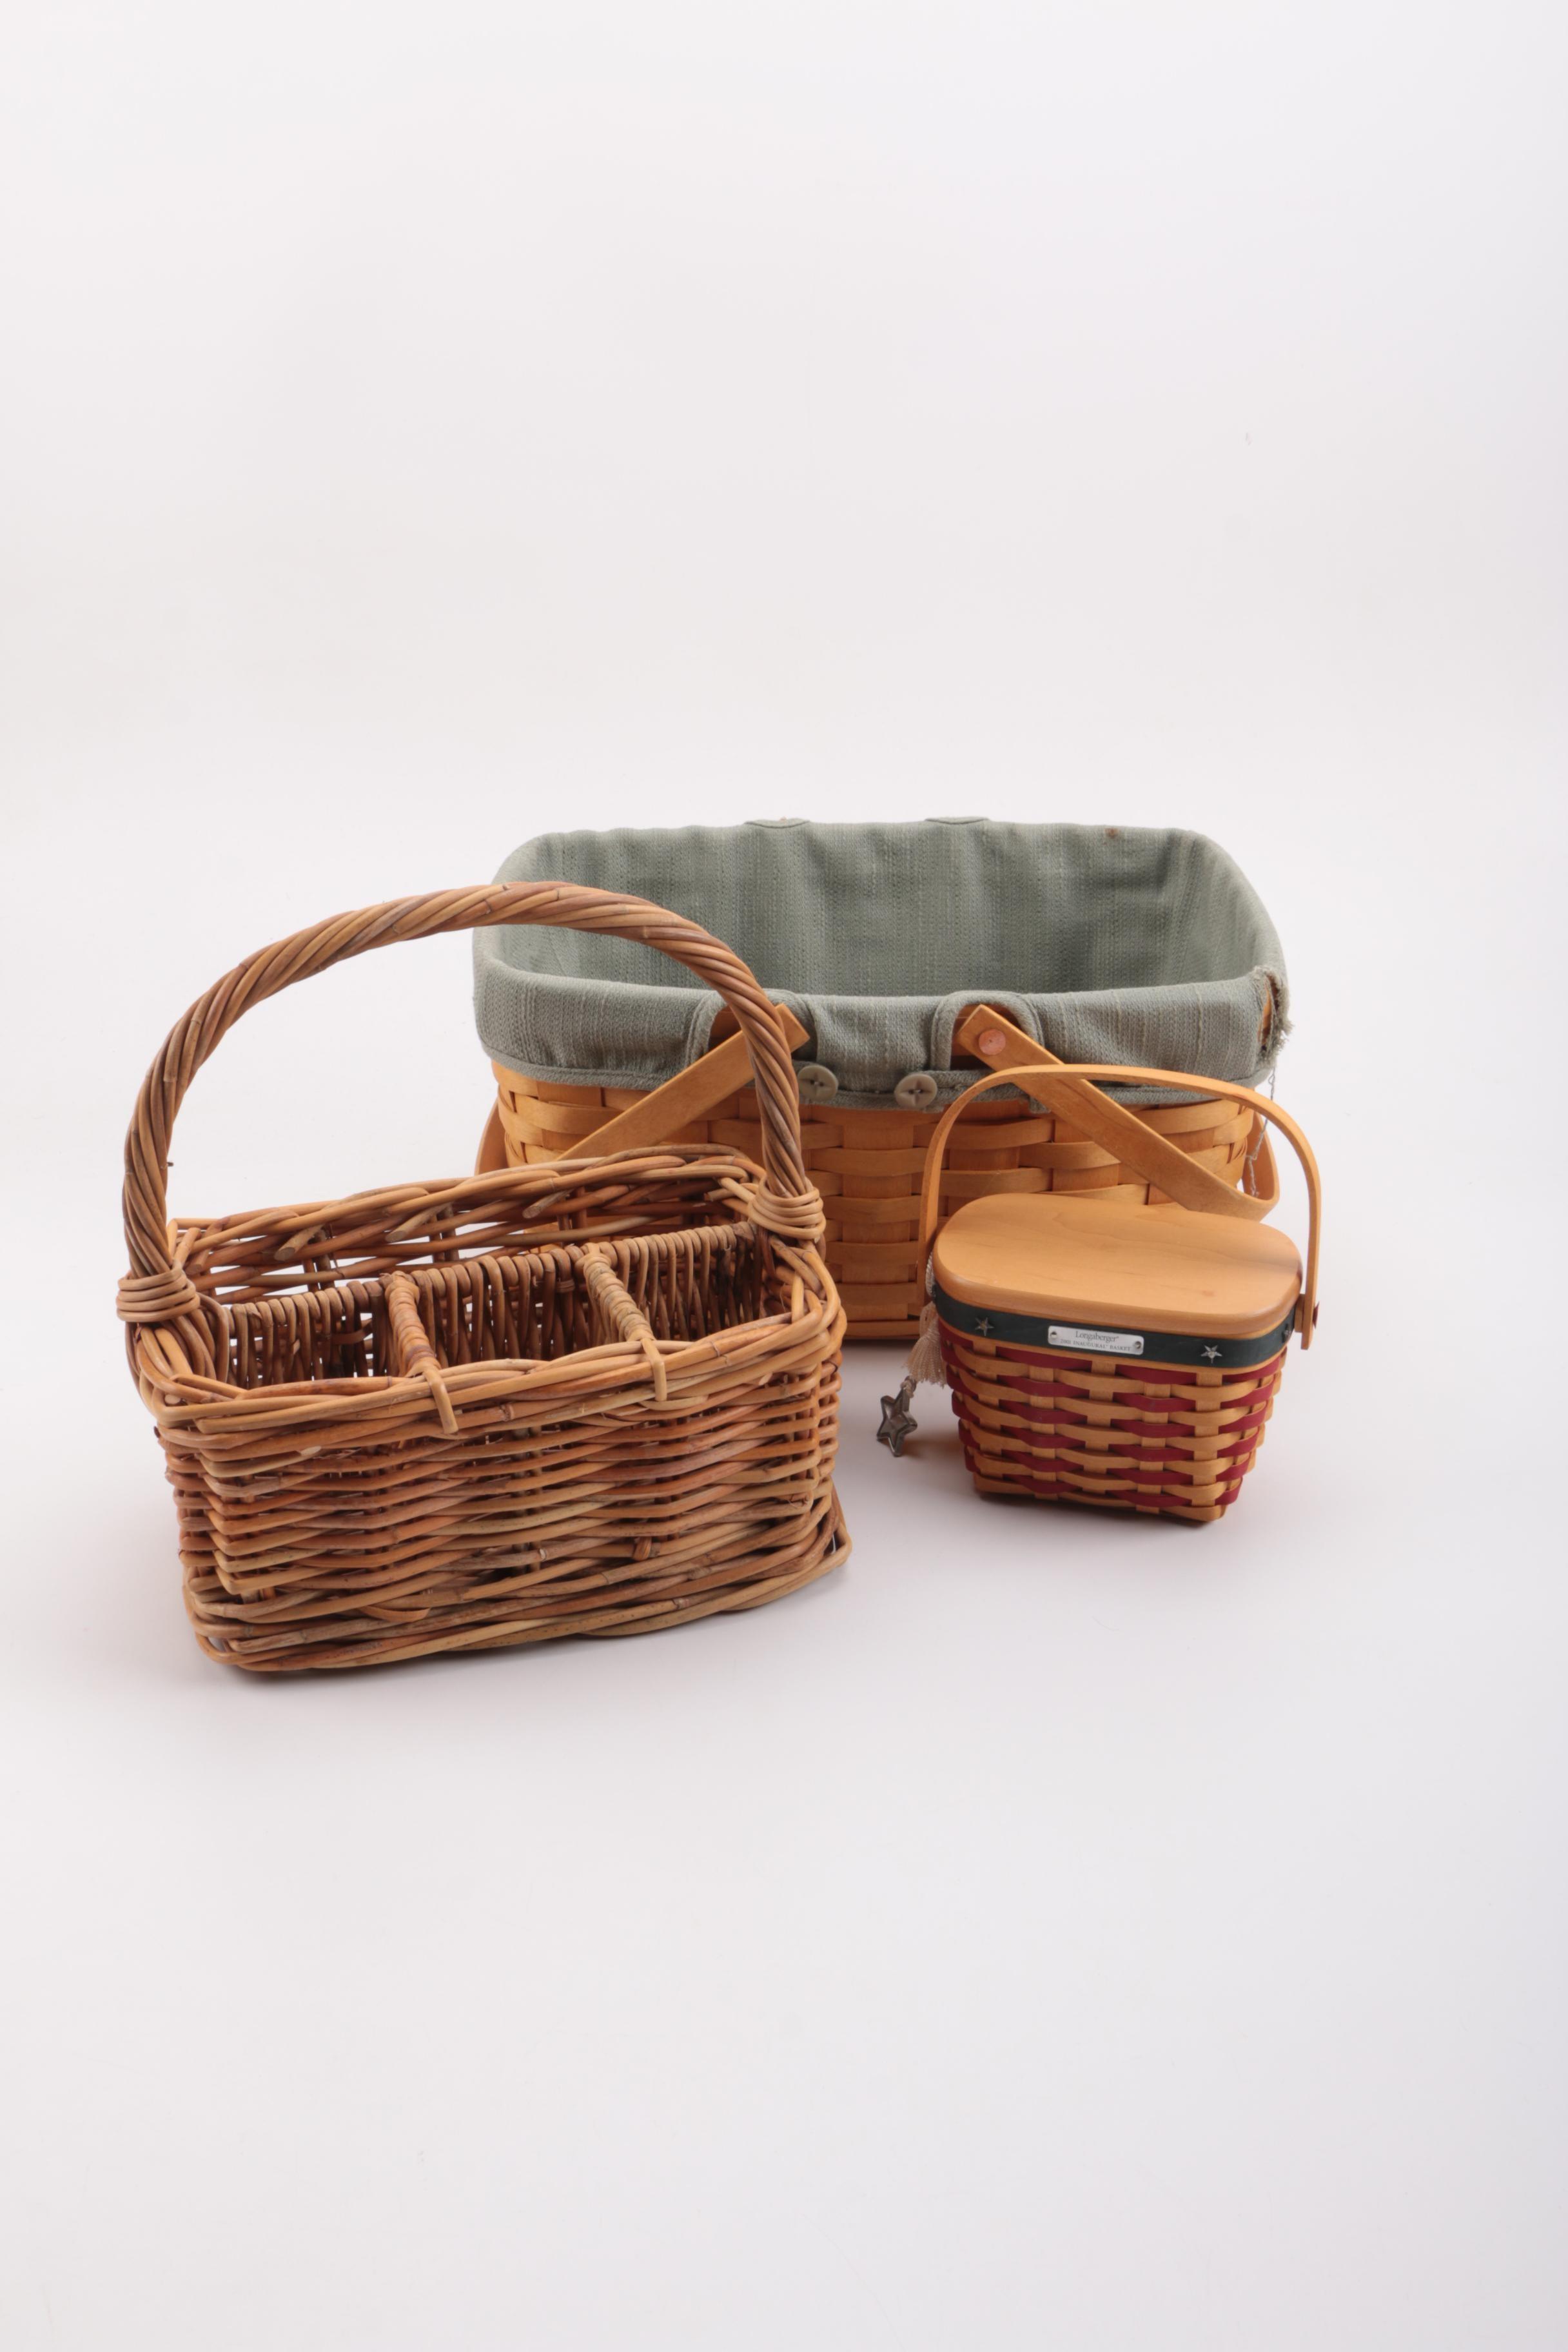 Assorted Wicker Baskets Including Longaberger